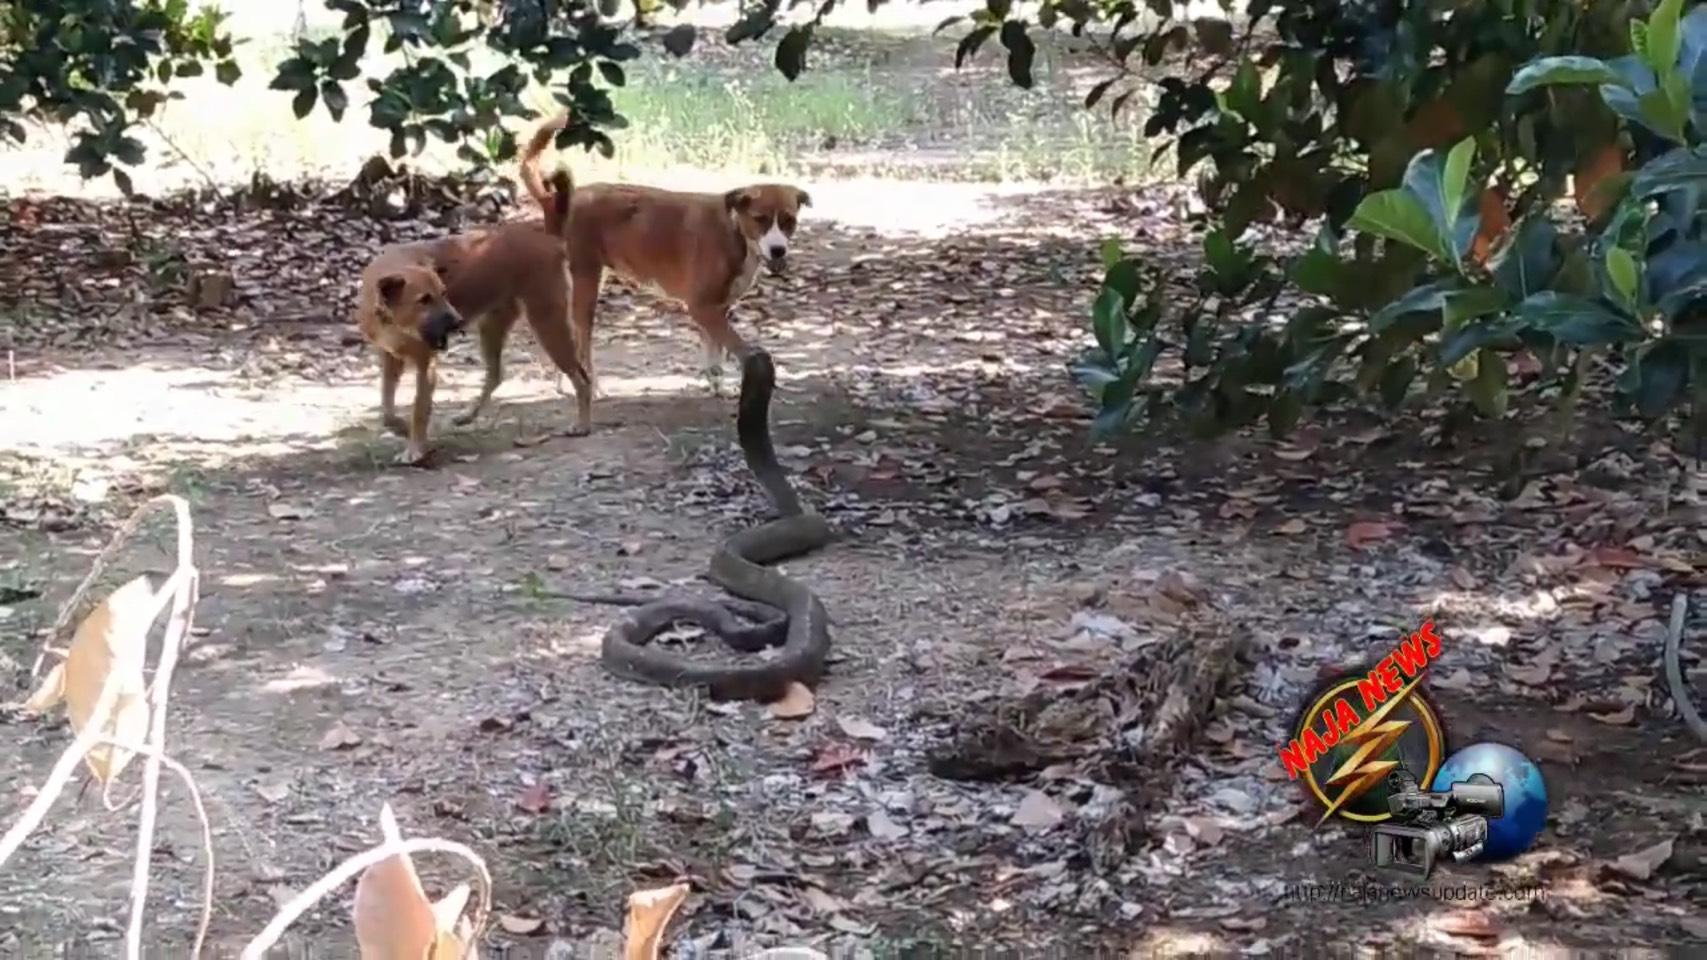 Dogilike.com :: สองสุนัขรุมกัดงูจงอางยักษ์ สุดท้ายเจ้าของหมาแจ้งกู้ภัยมาช่วยงู